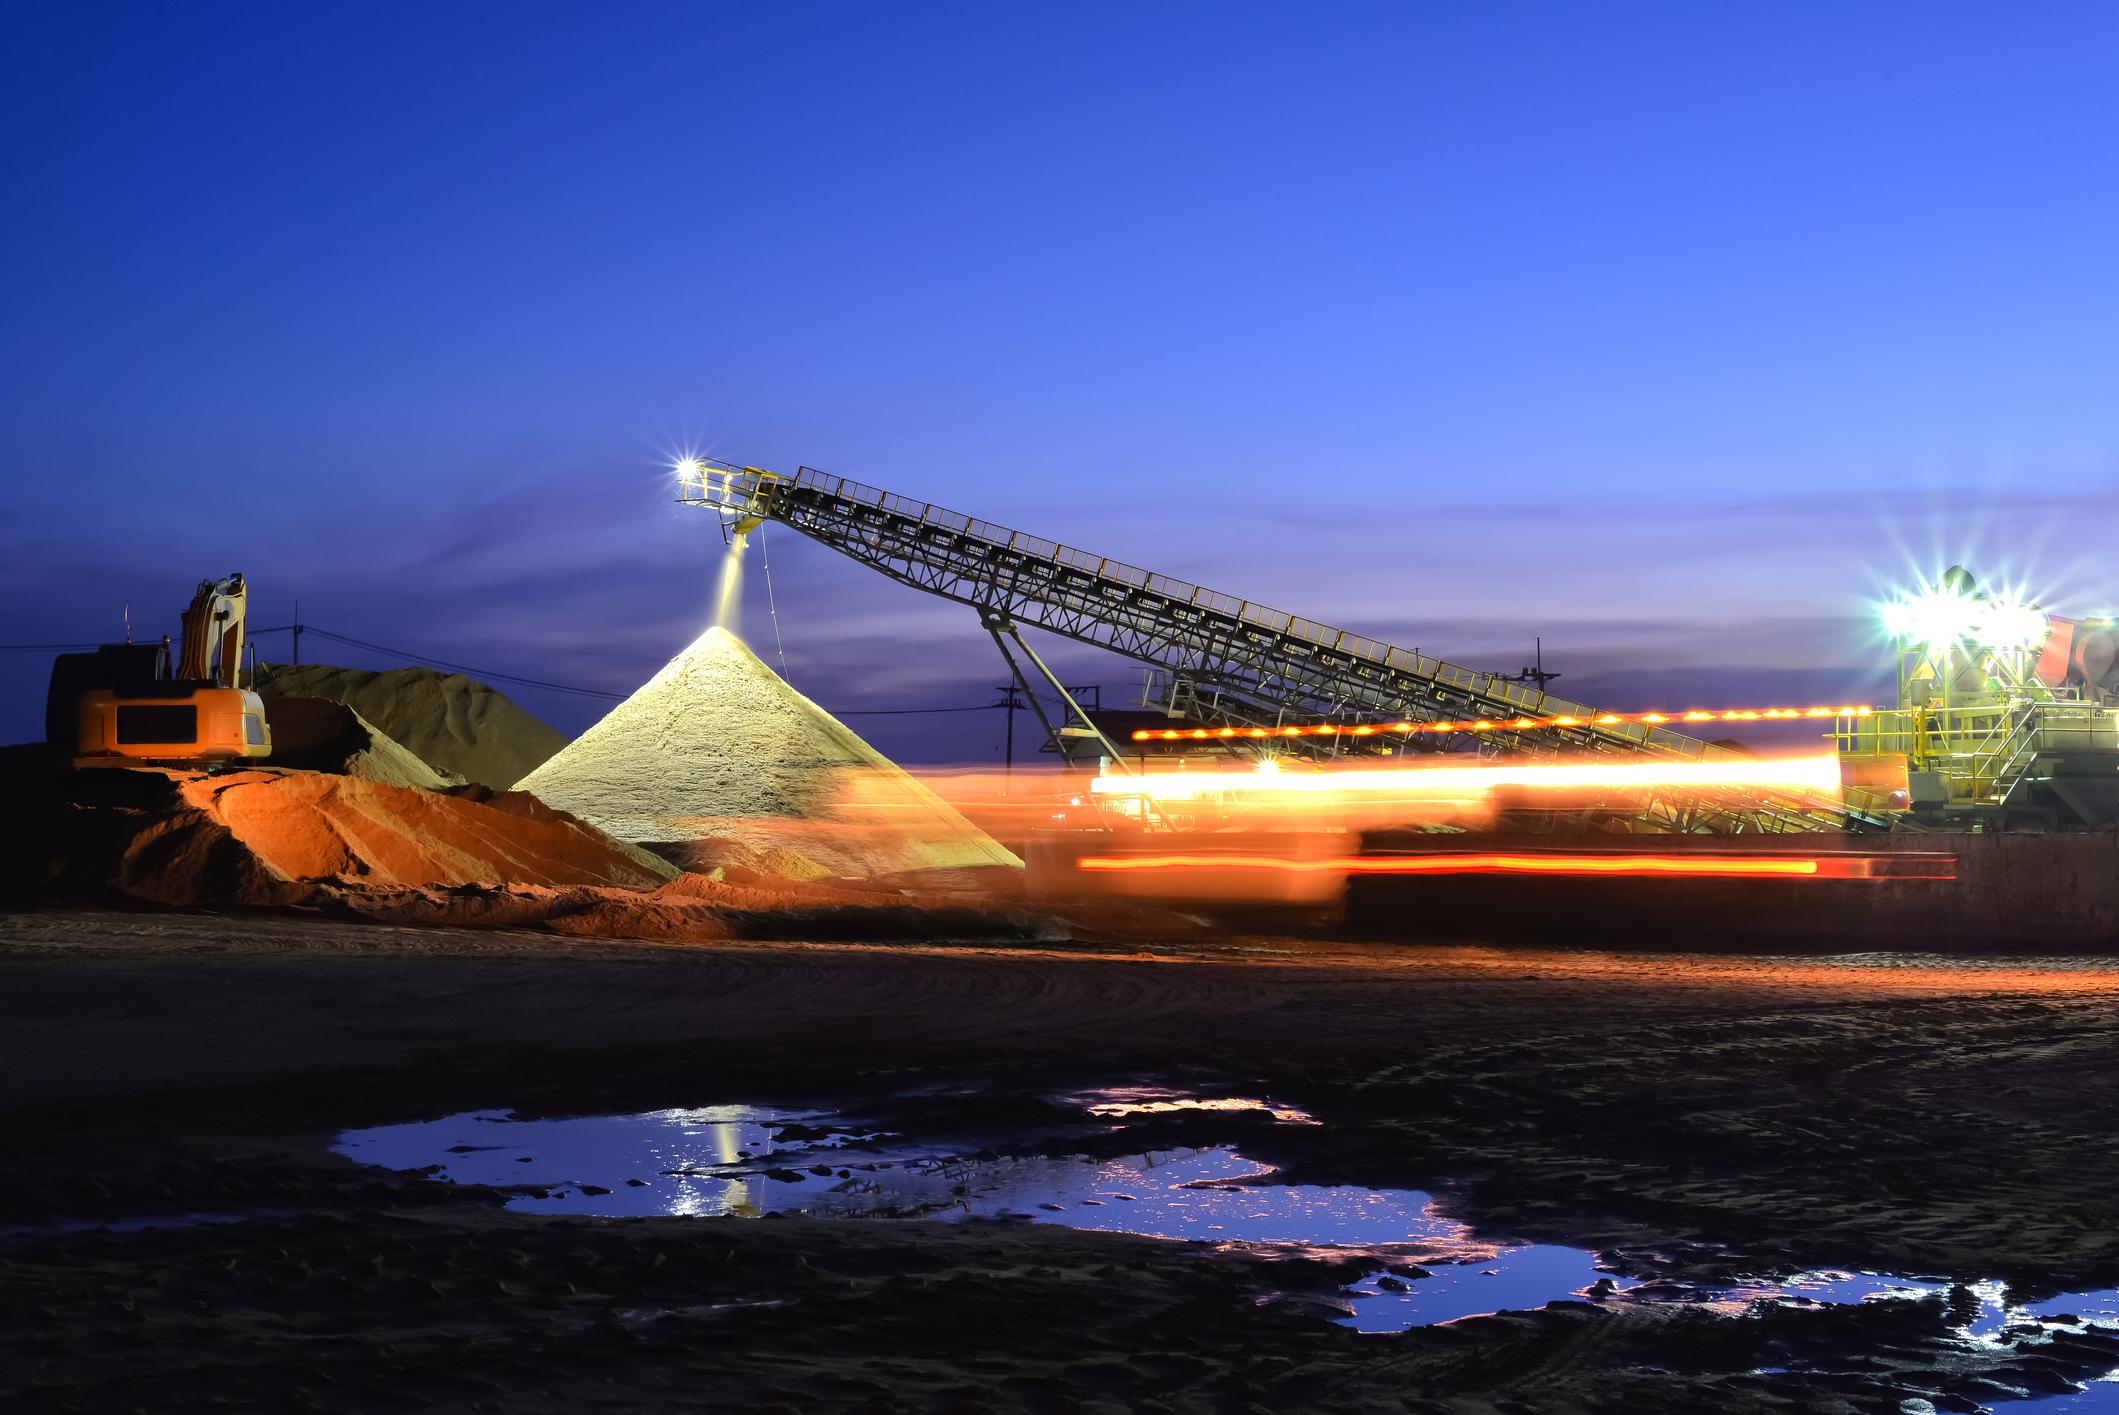 Sand mine running at night